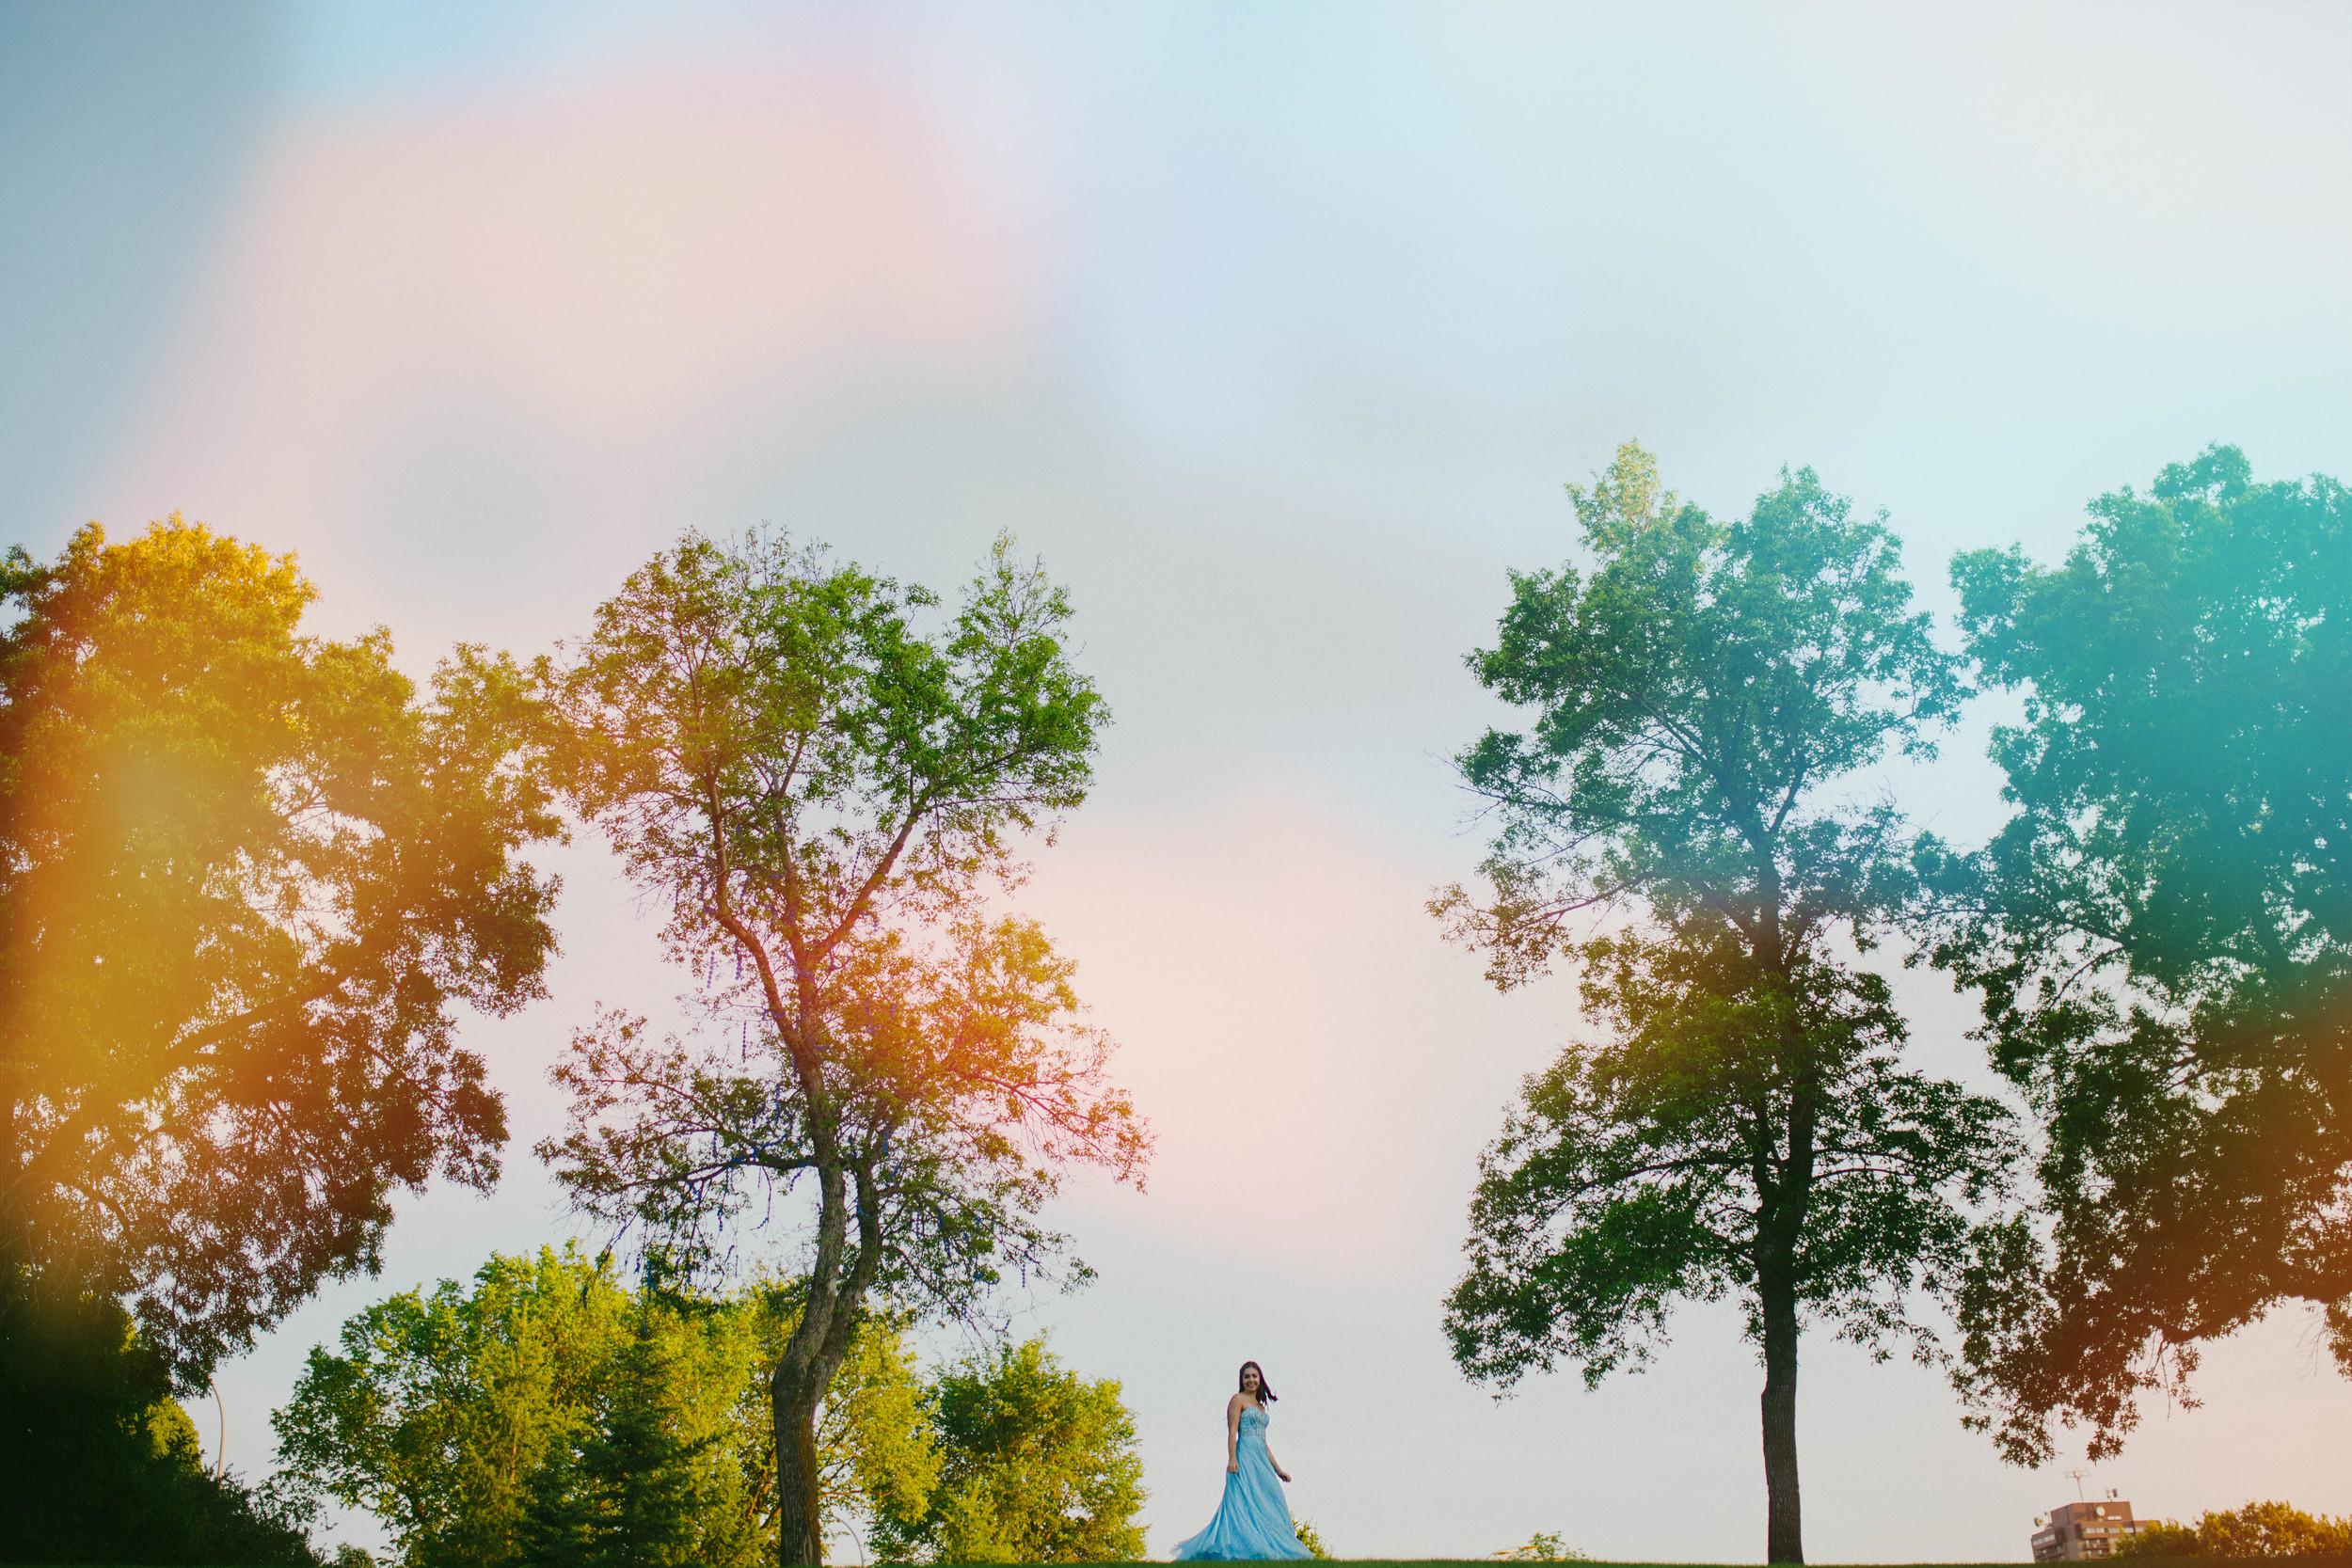 5D3_7951-Edit.jpg